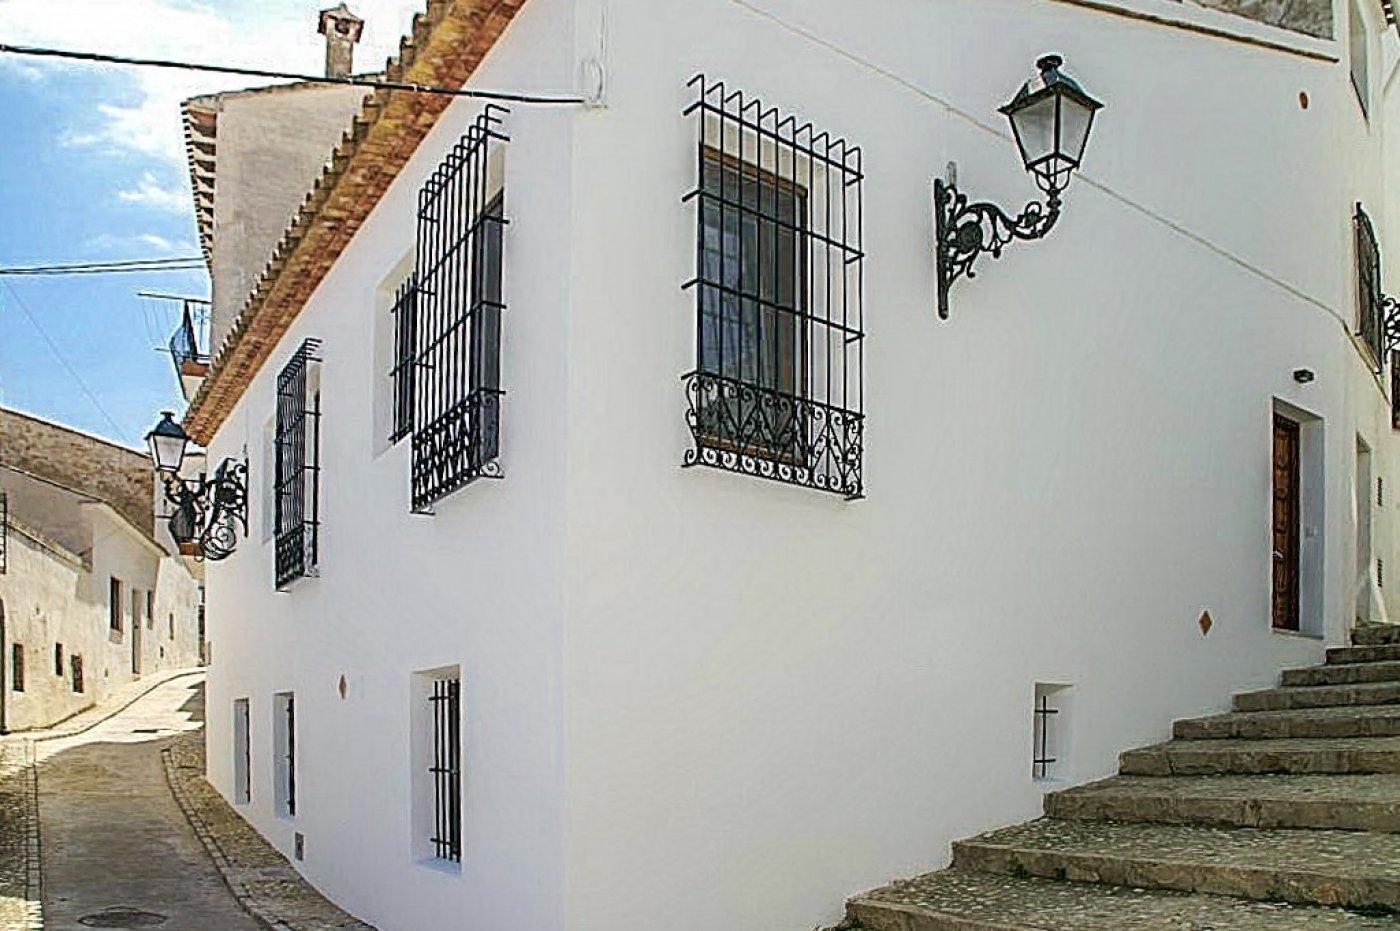 Real Estate Agents Altea - Properties for sale in Altea - townhouse - altea